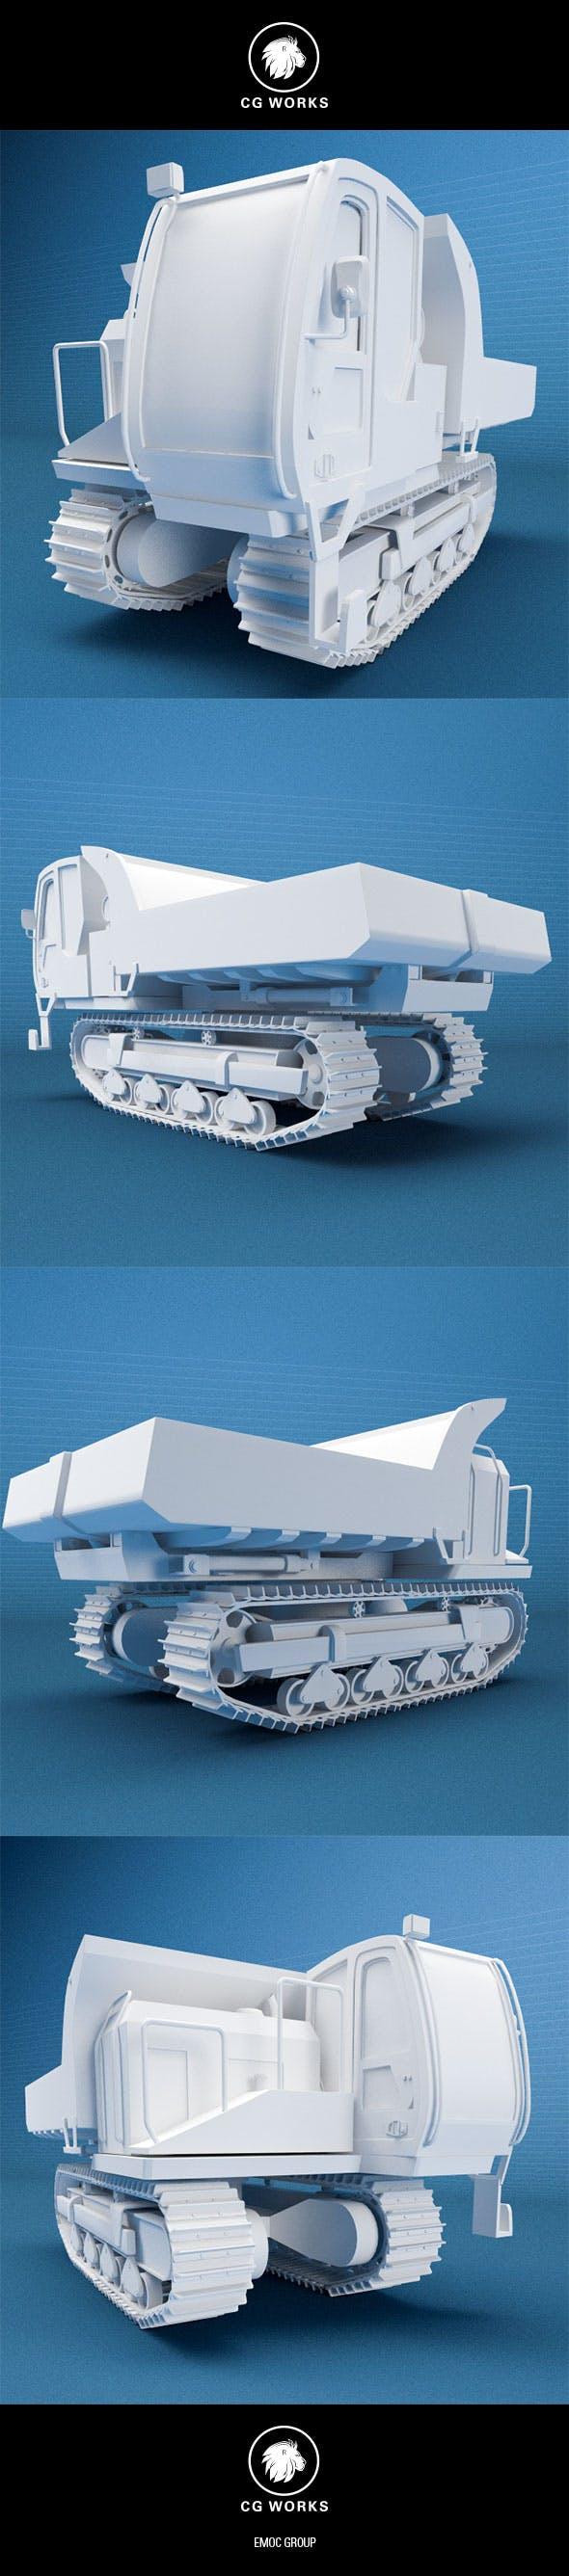 Construction machinery C4D & OBJ XII - 3DOcean Item for Sale